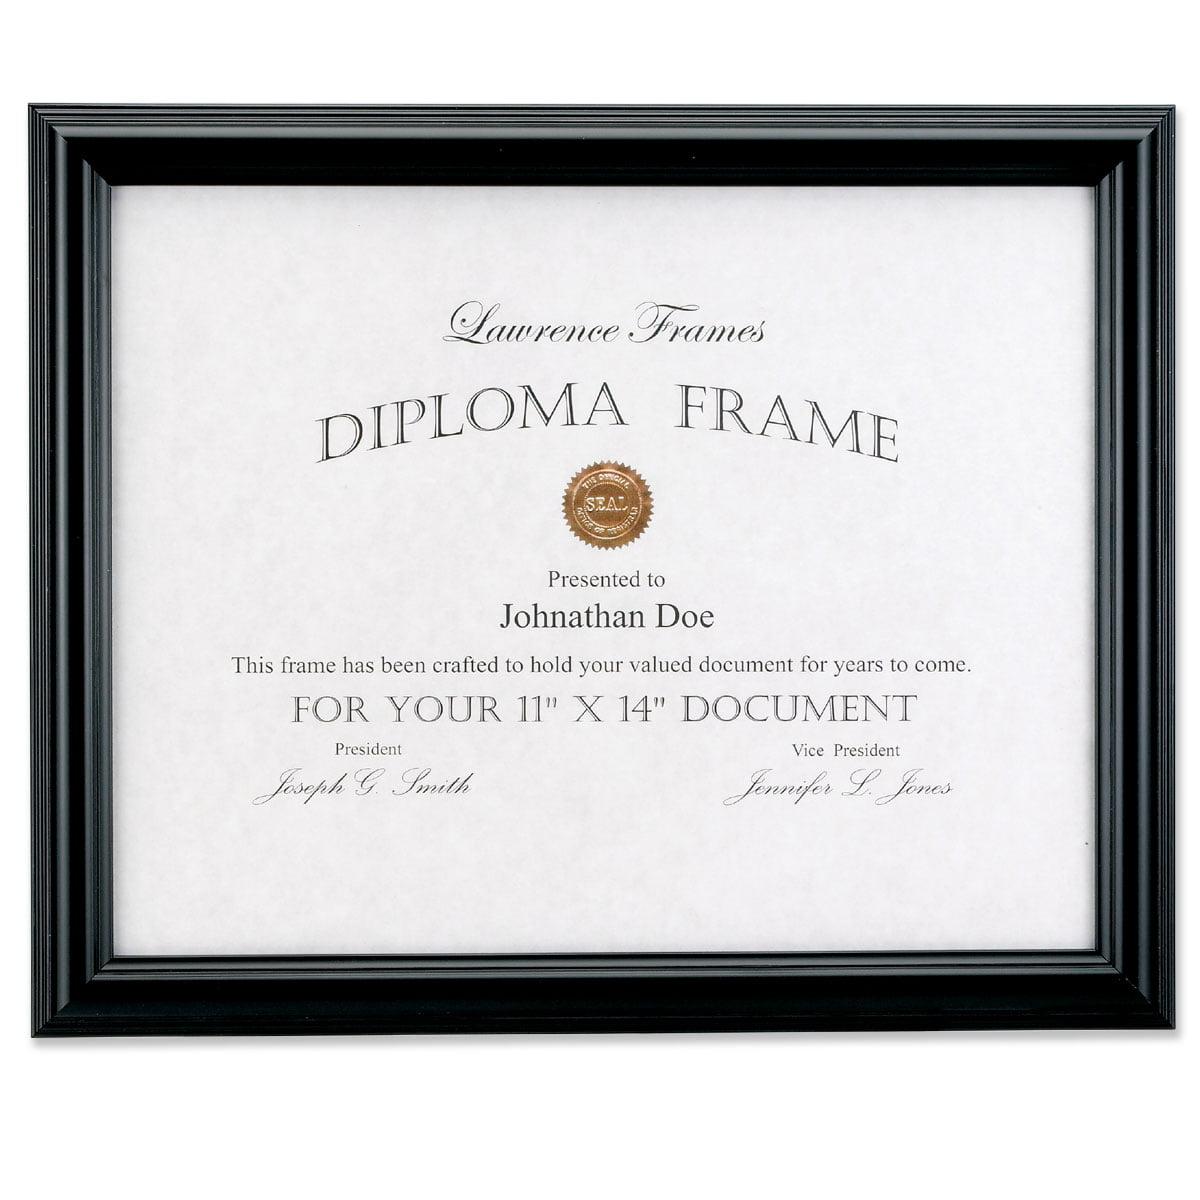 11x14 Black Diploma Frame - Domed Top - Walmart.com